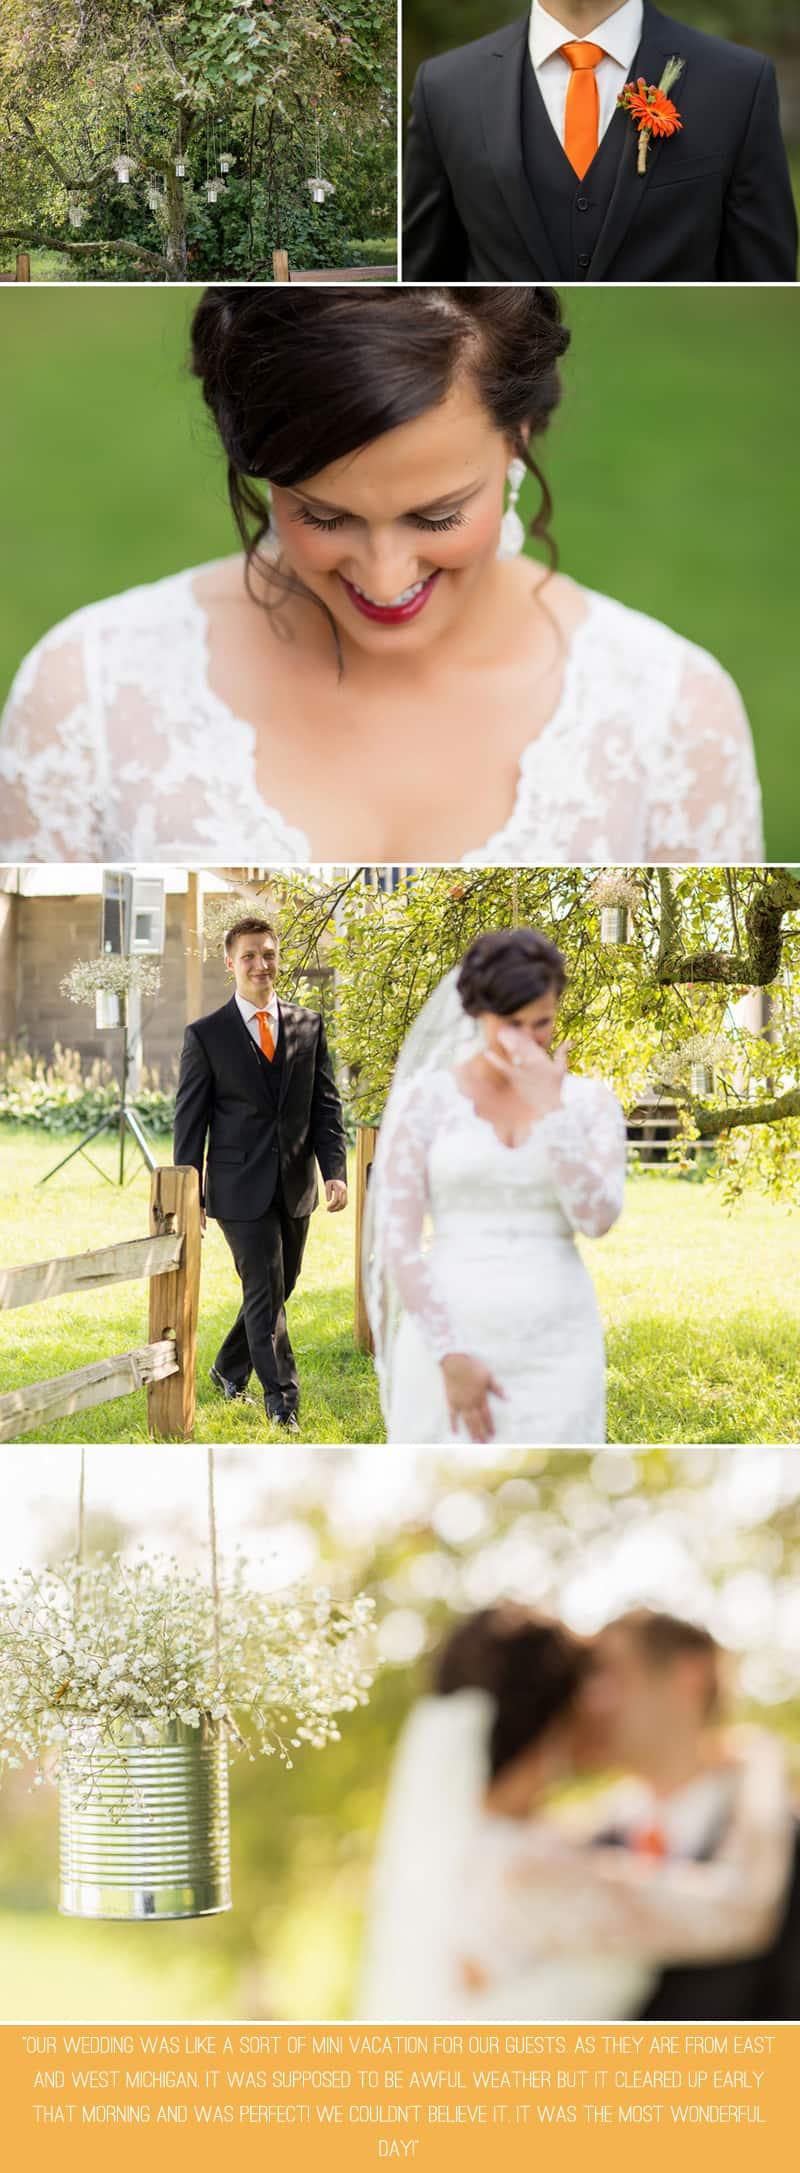 A Romantic Fall Wedding in a Rustic Barn 2